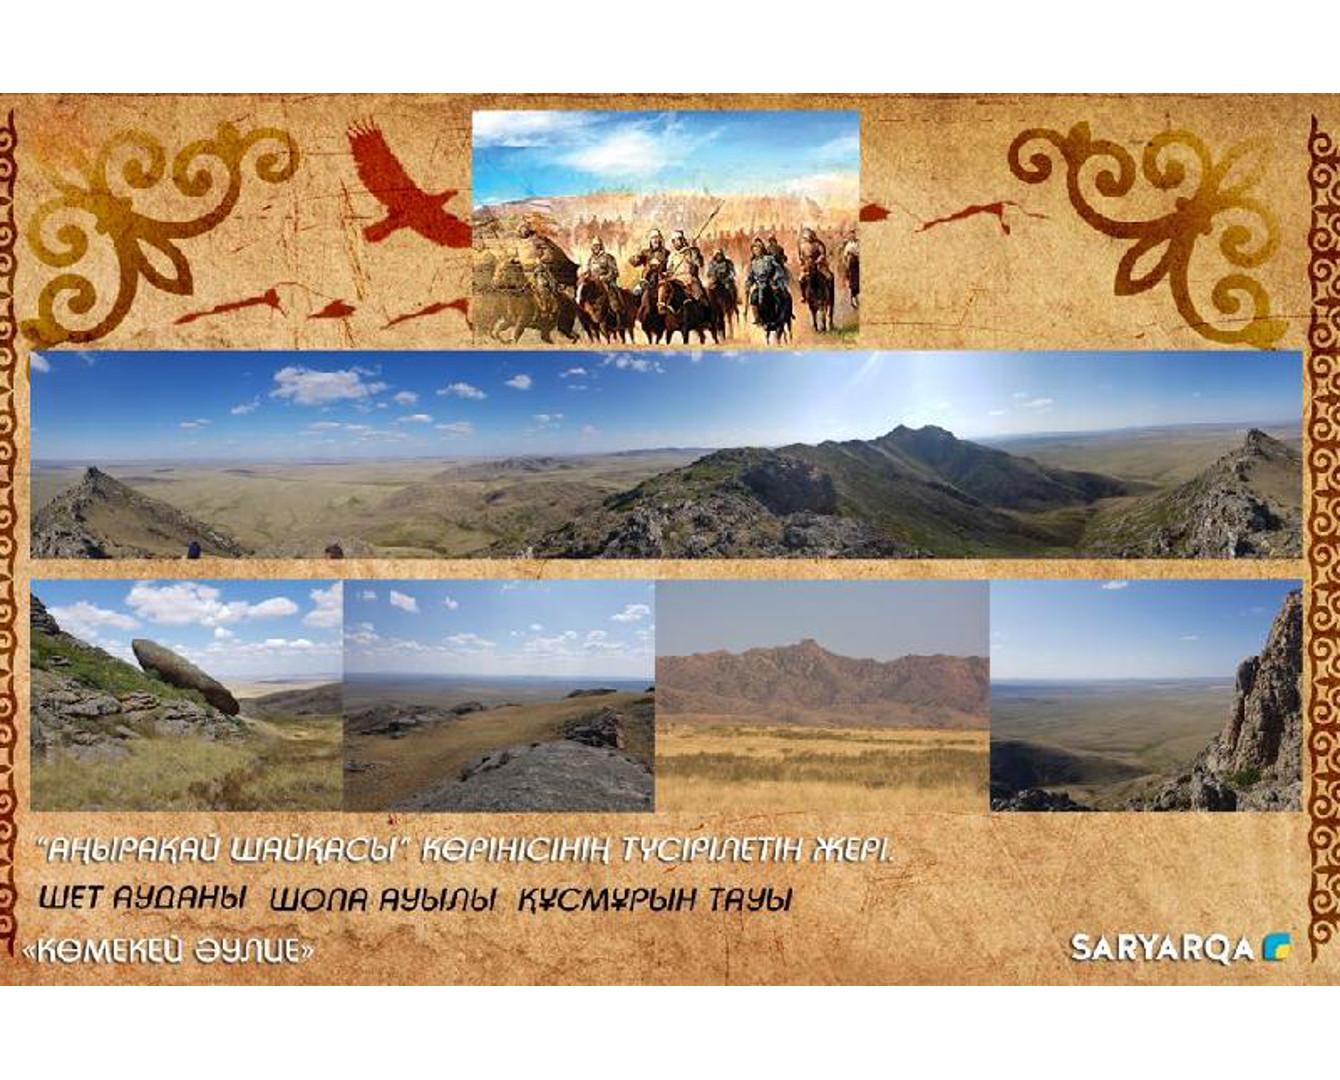 Фильм о Бухар жырау снимут в Карагандинской области